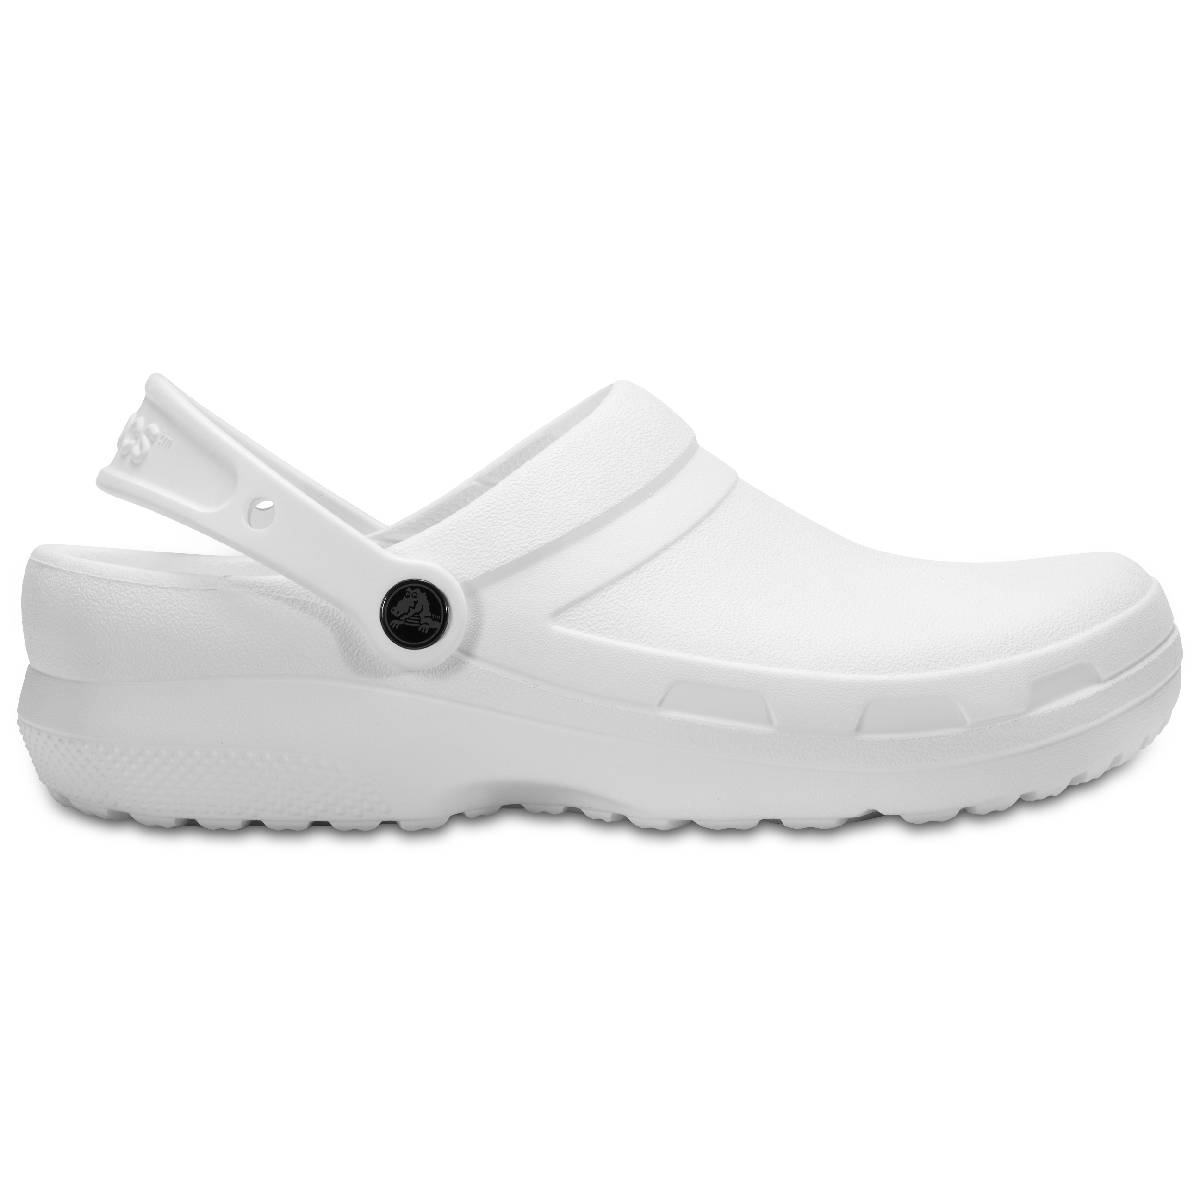 Specialist II Clog - Beyaz